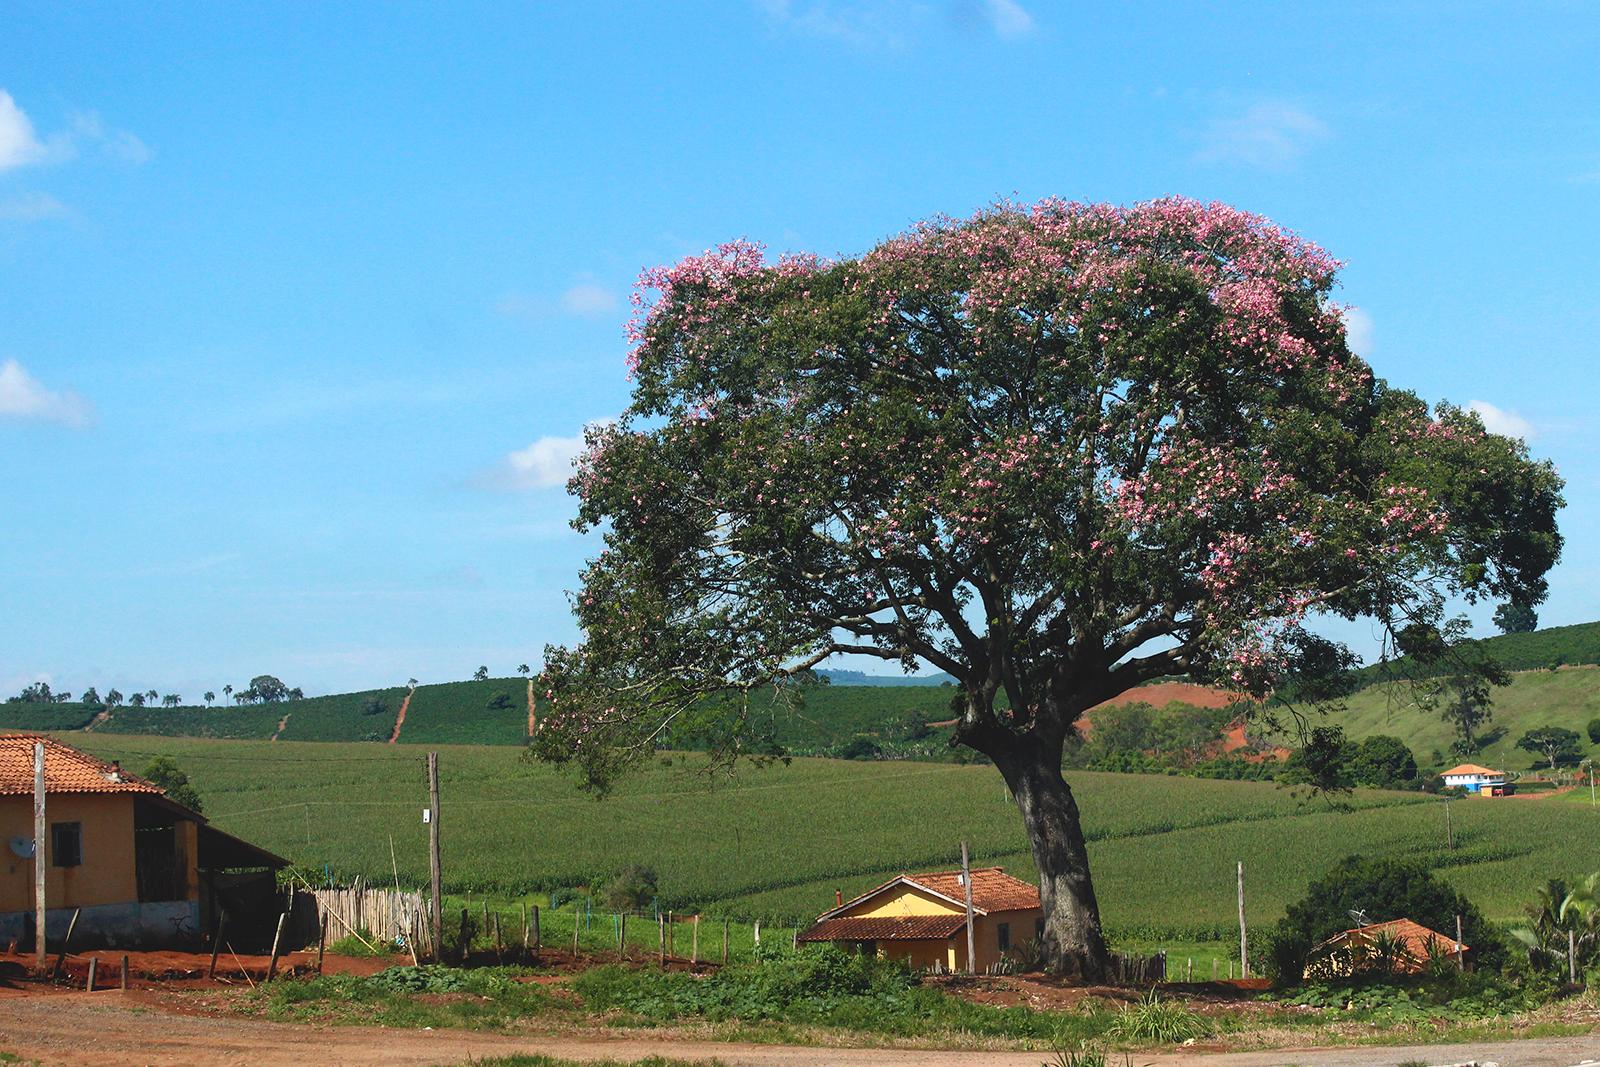 paisagem rural árvore casa simples